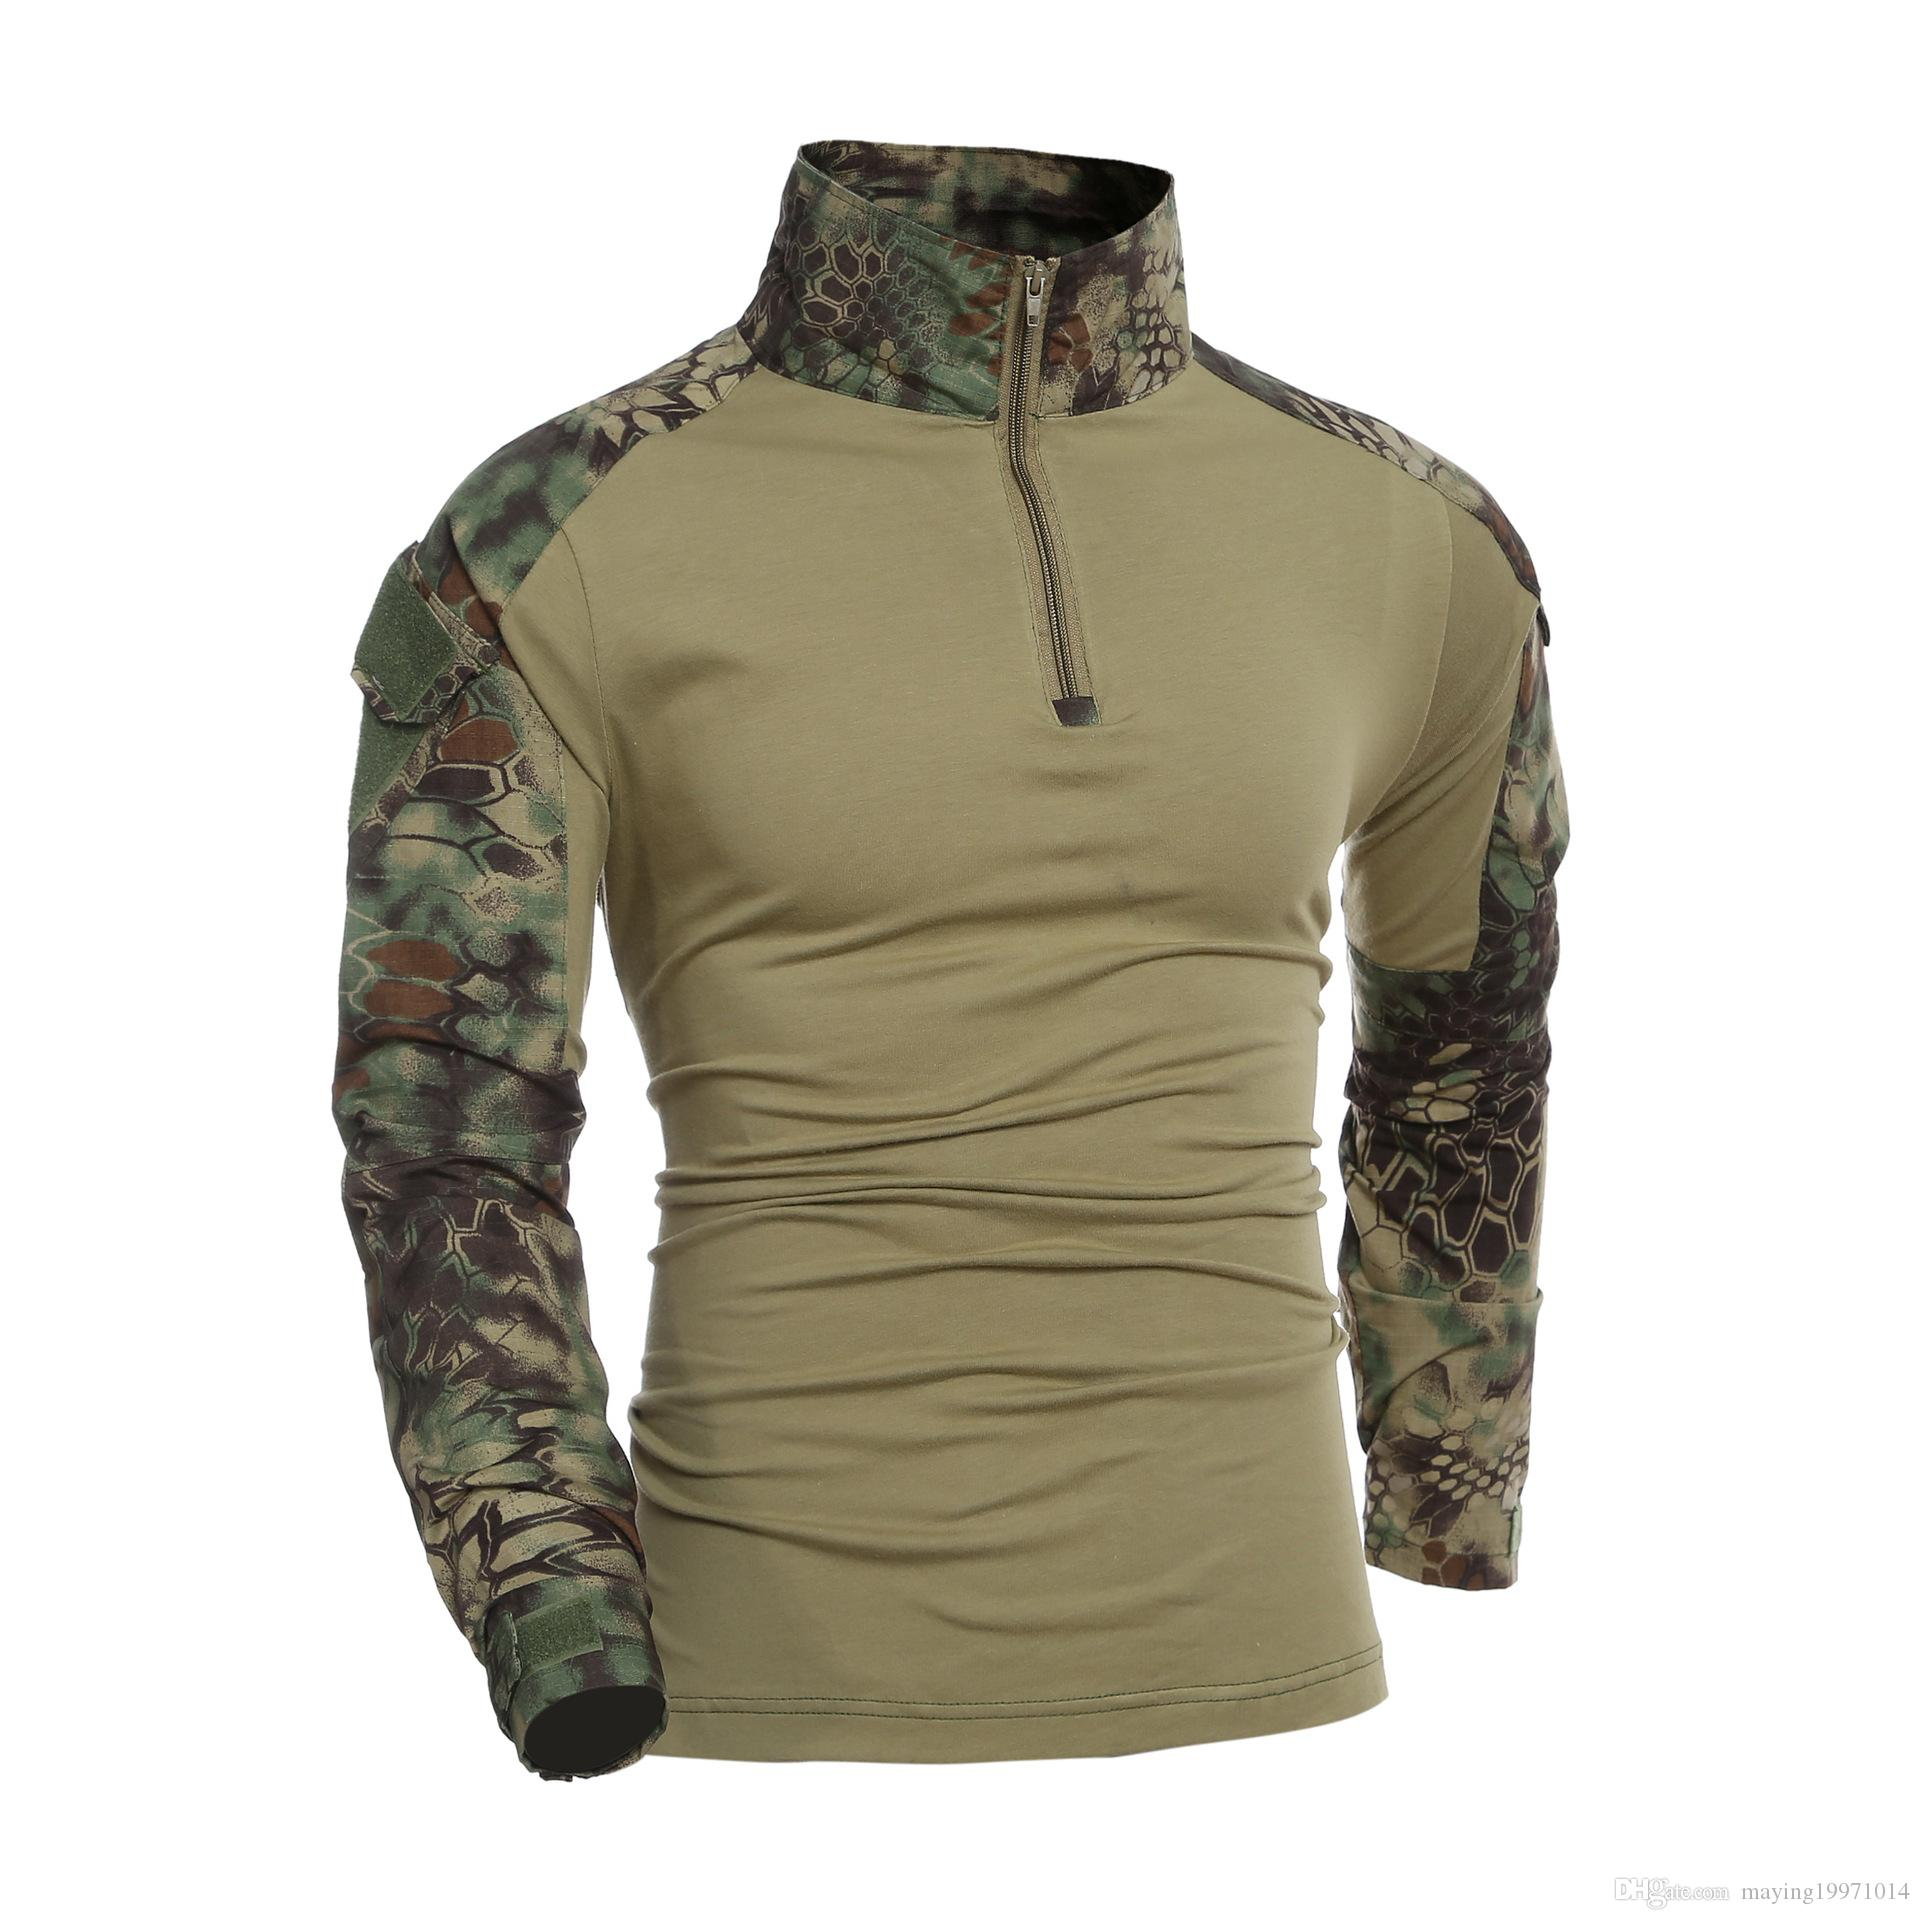 d811f1ea4a Compre Camiseta De Camuflaje Camiseta De Combate Militar Para El Ejército  Camiseta De Manga Larga Para Hombre De EE. UU. Camiseta Táctica De Camuflaje  ...